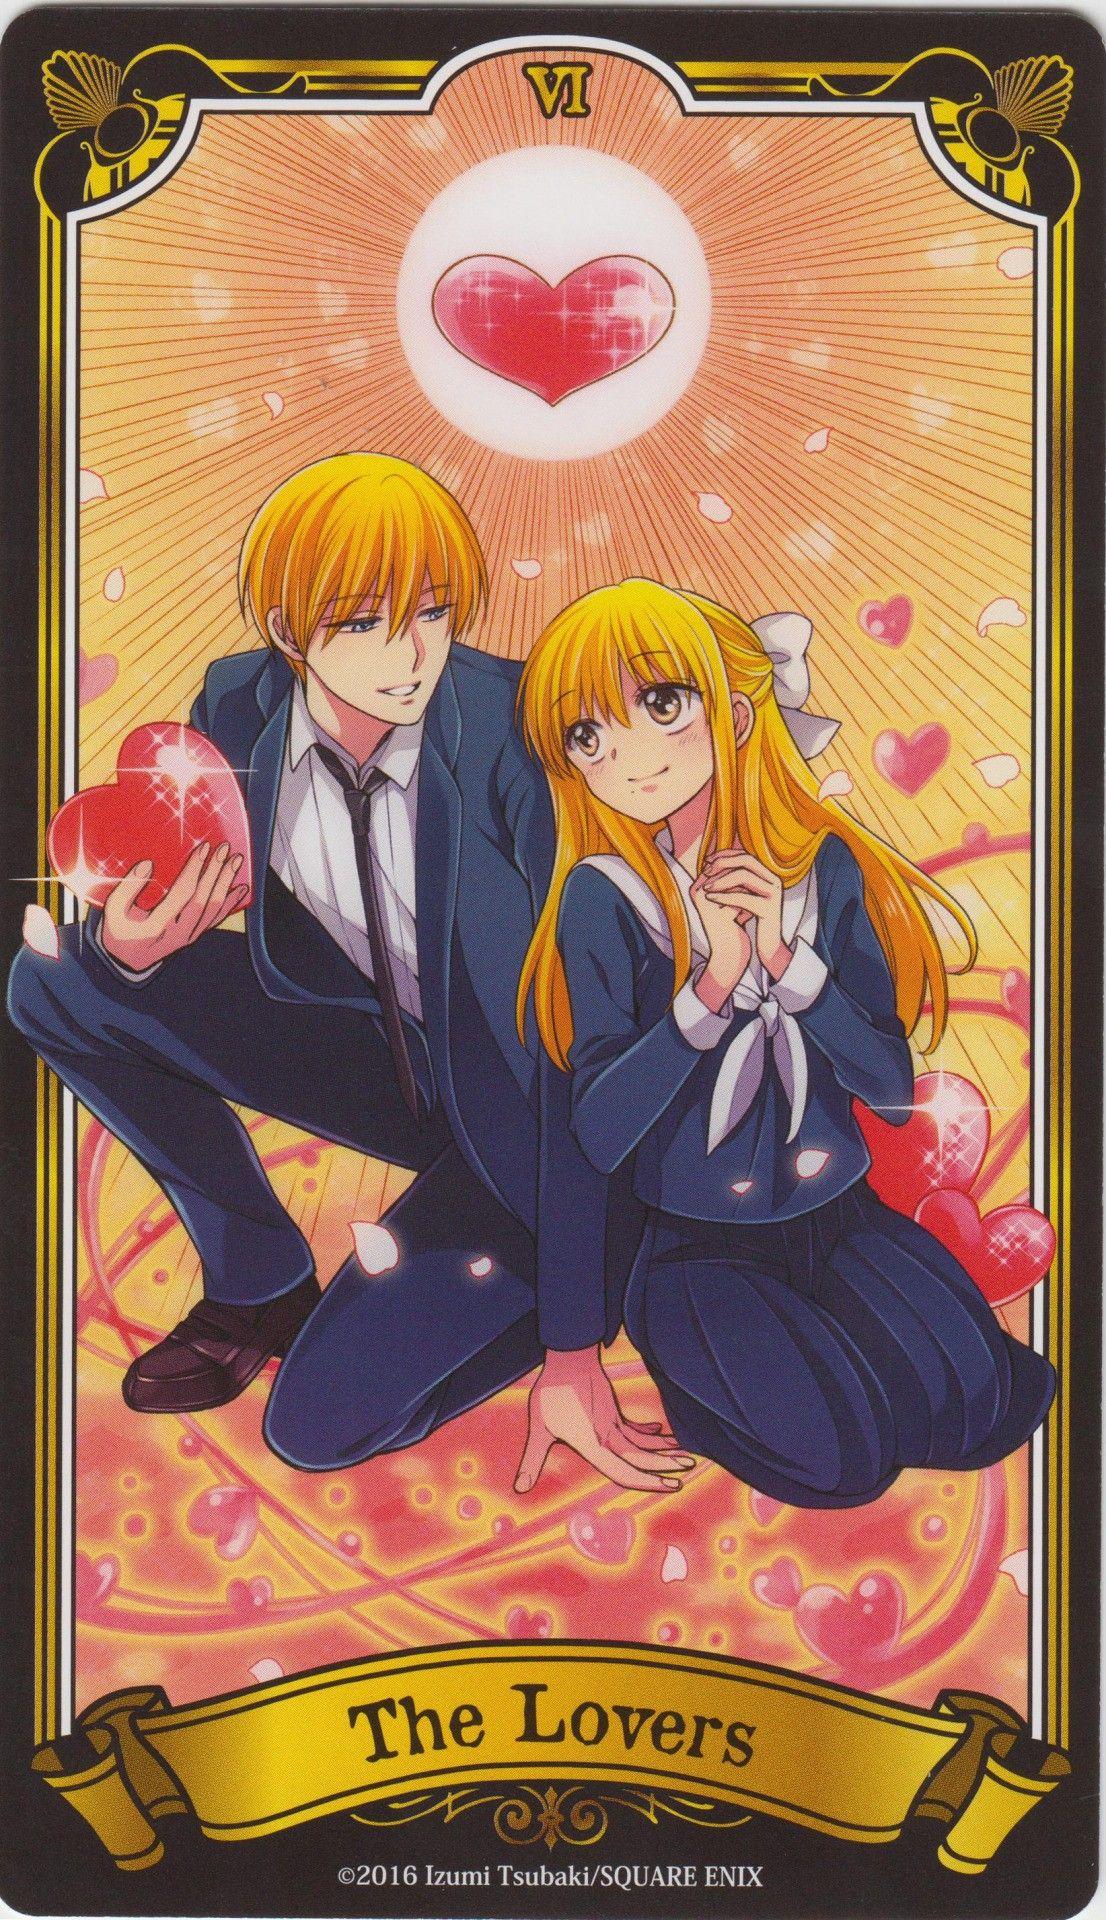 Pin de 09021314 em 月刊少女野崎君 imagens) Anime